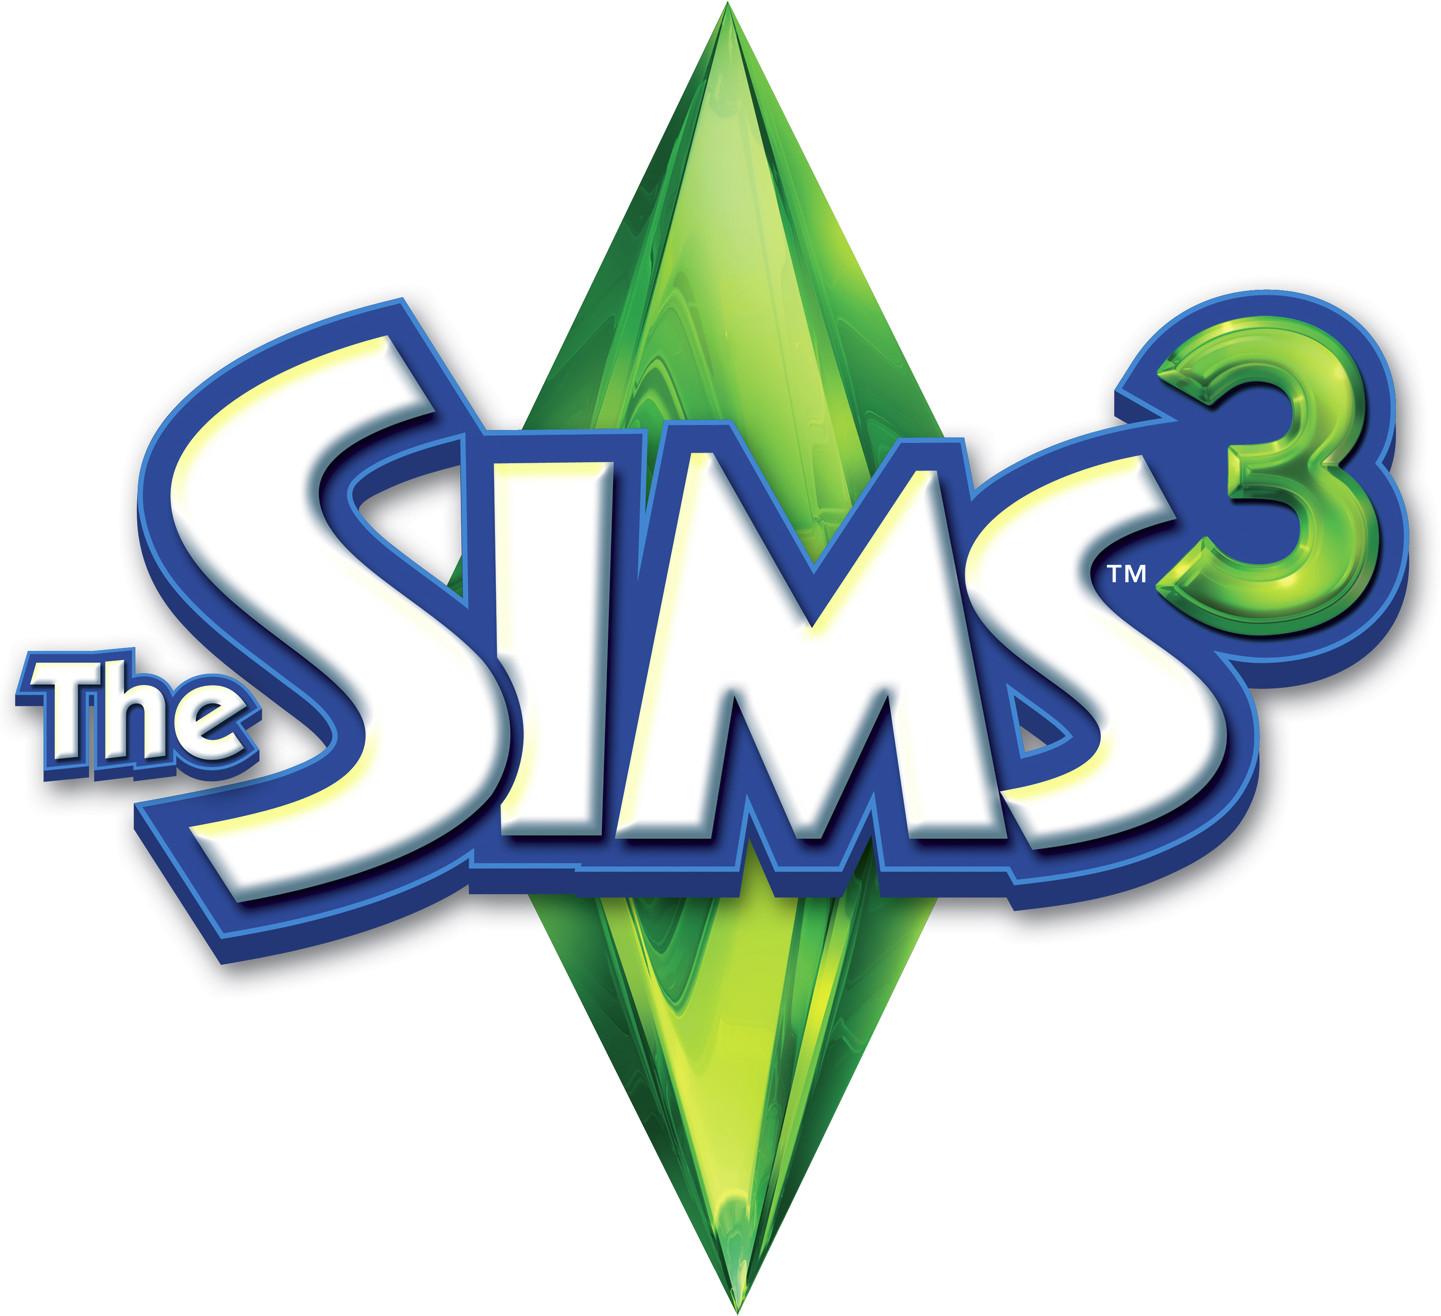 Sims 3 Logo (not My Work)